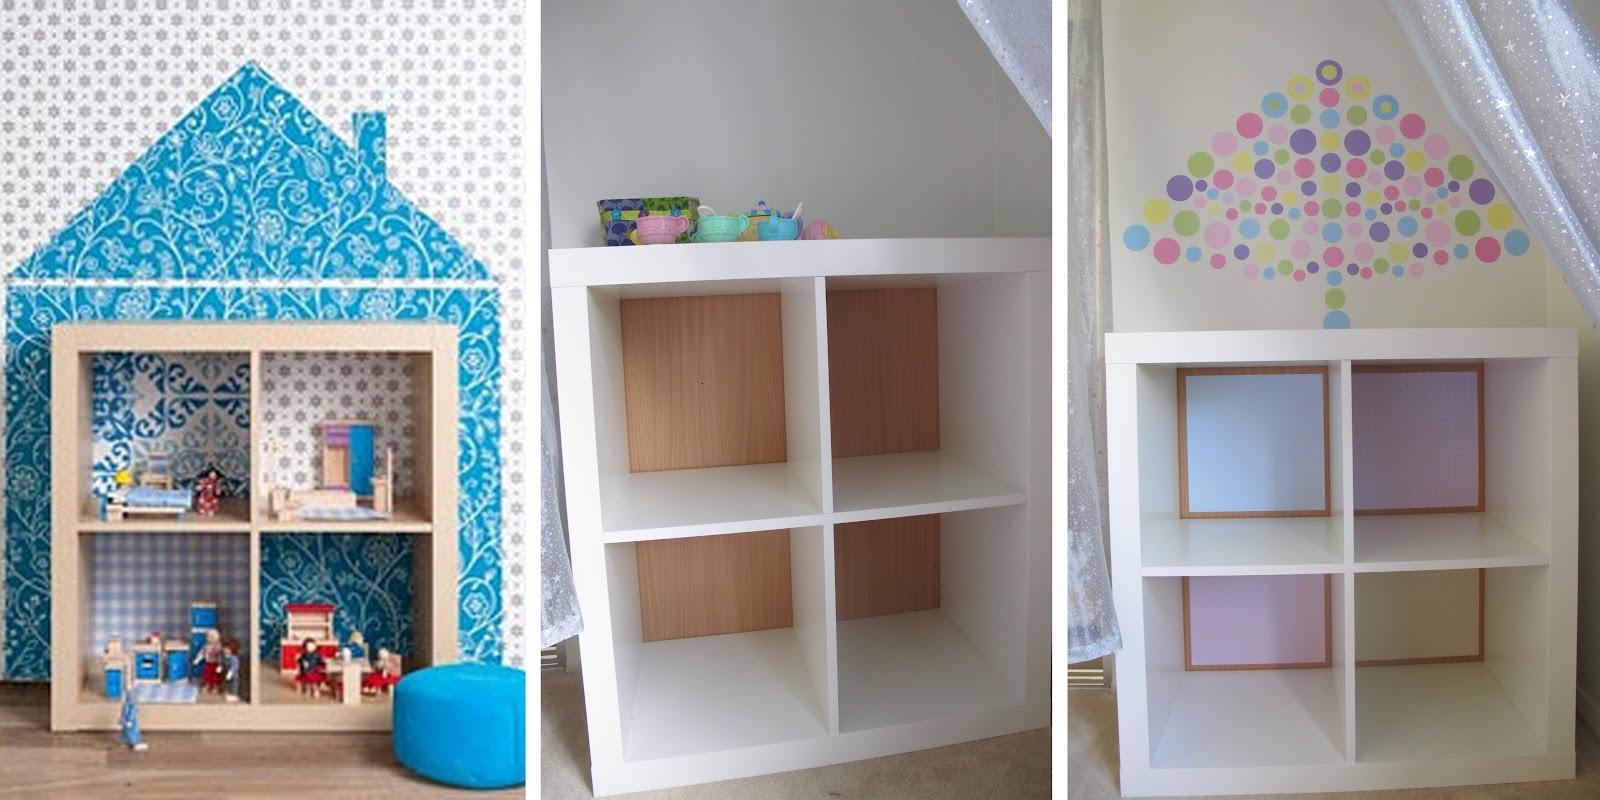 little ladybird ikea hack bookshelf turned dollhouse. Black Bedroom Furniture Sets. Home Design Ideas